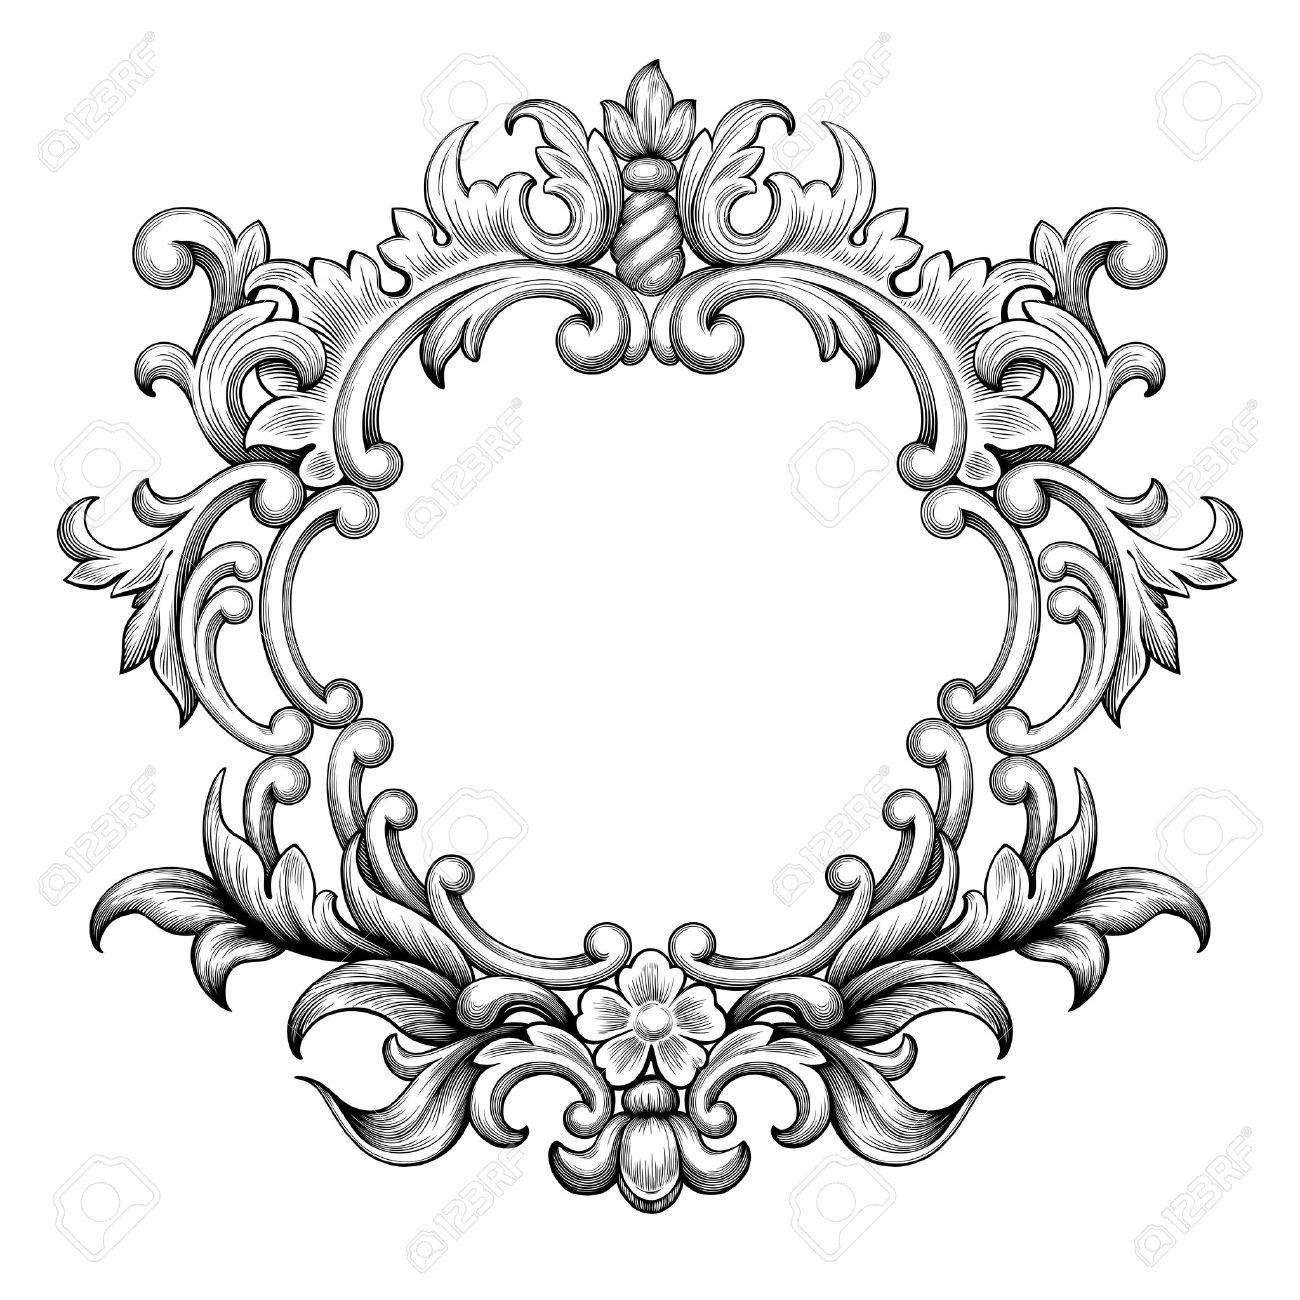 vintage baroque frame border leaf scroll floral ornament engraving royalty free cliparts vectors and stock illustration image 46103804 vintage baroque frame border leaf scroll floral ornament engraving